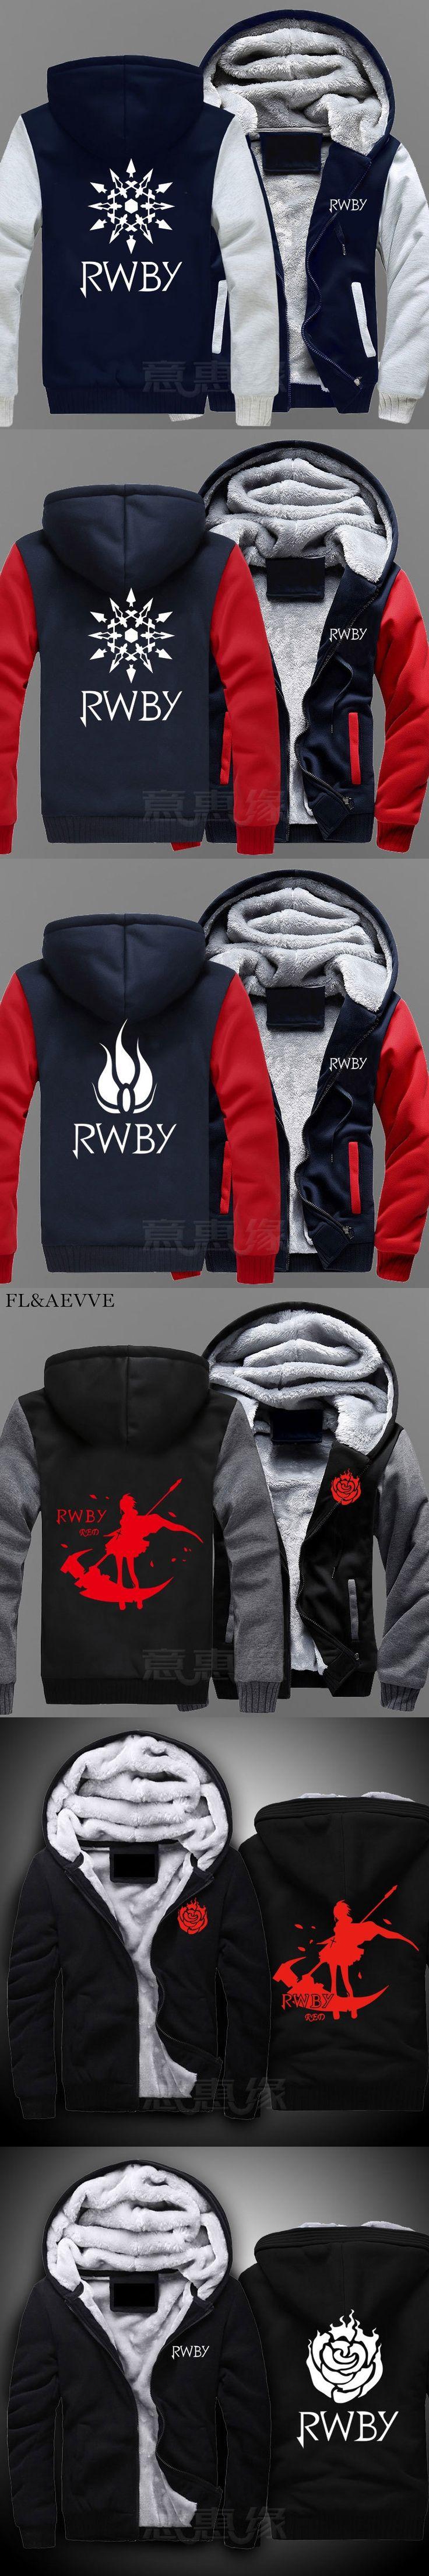 FL&AEVVE New RWBY Hoodie Ruby Rose Anime Coat Jacket Winter Men Thick Zipper Sweatshirt